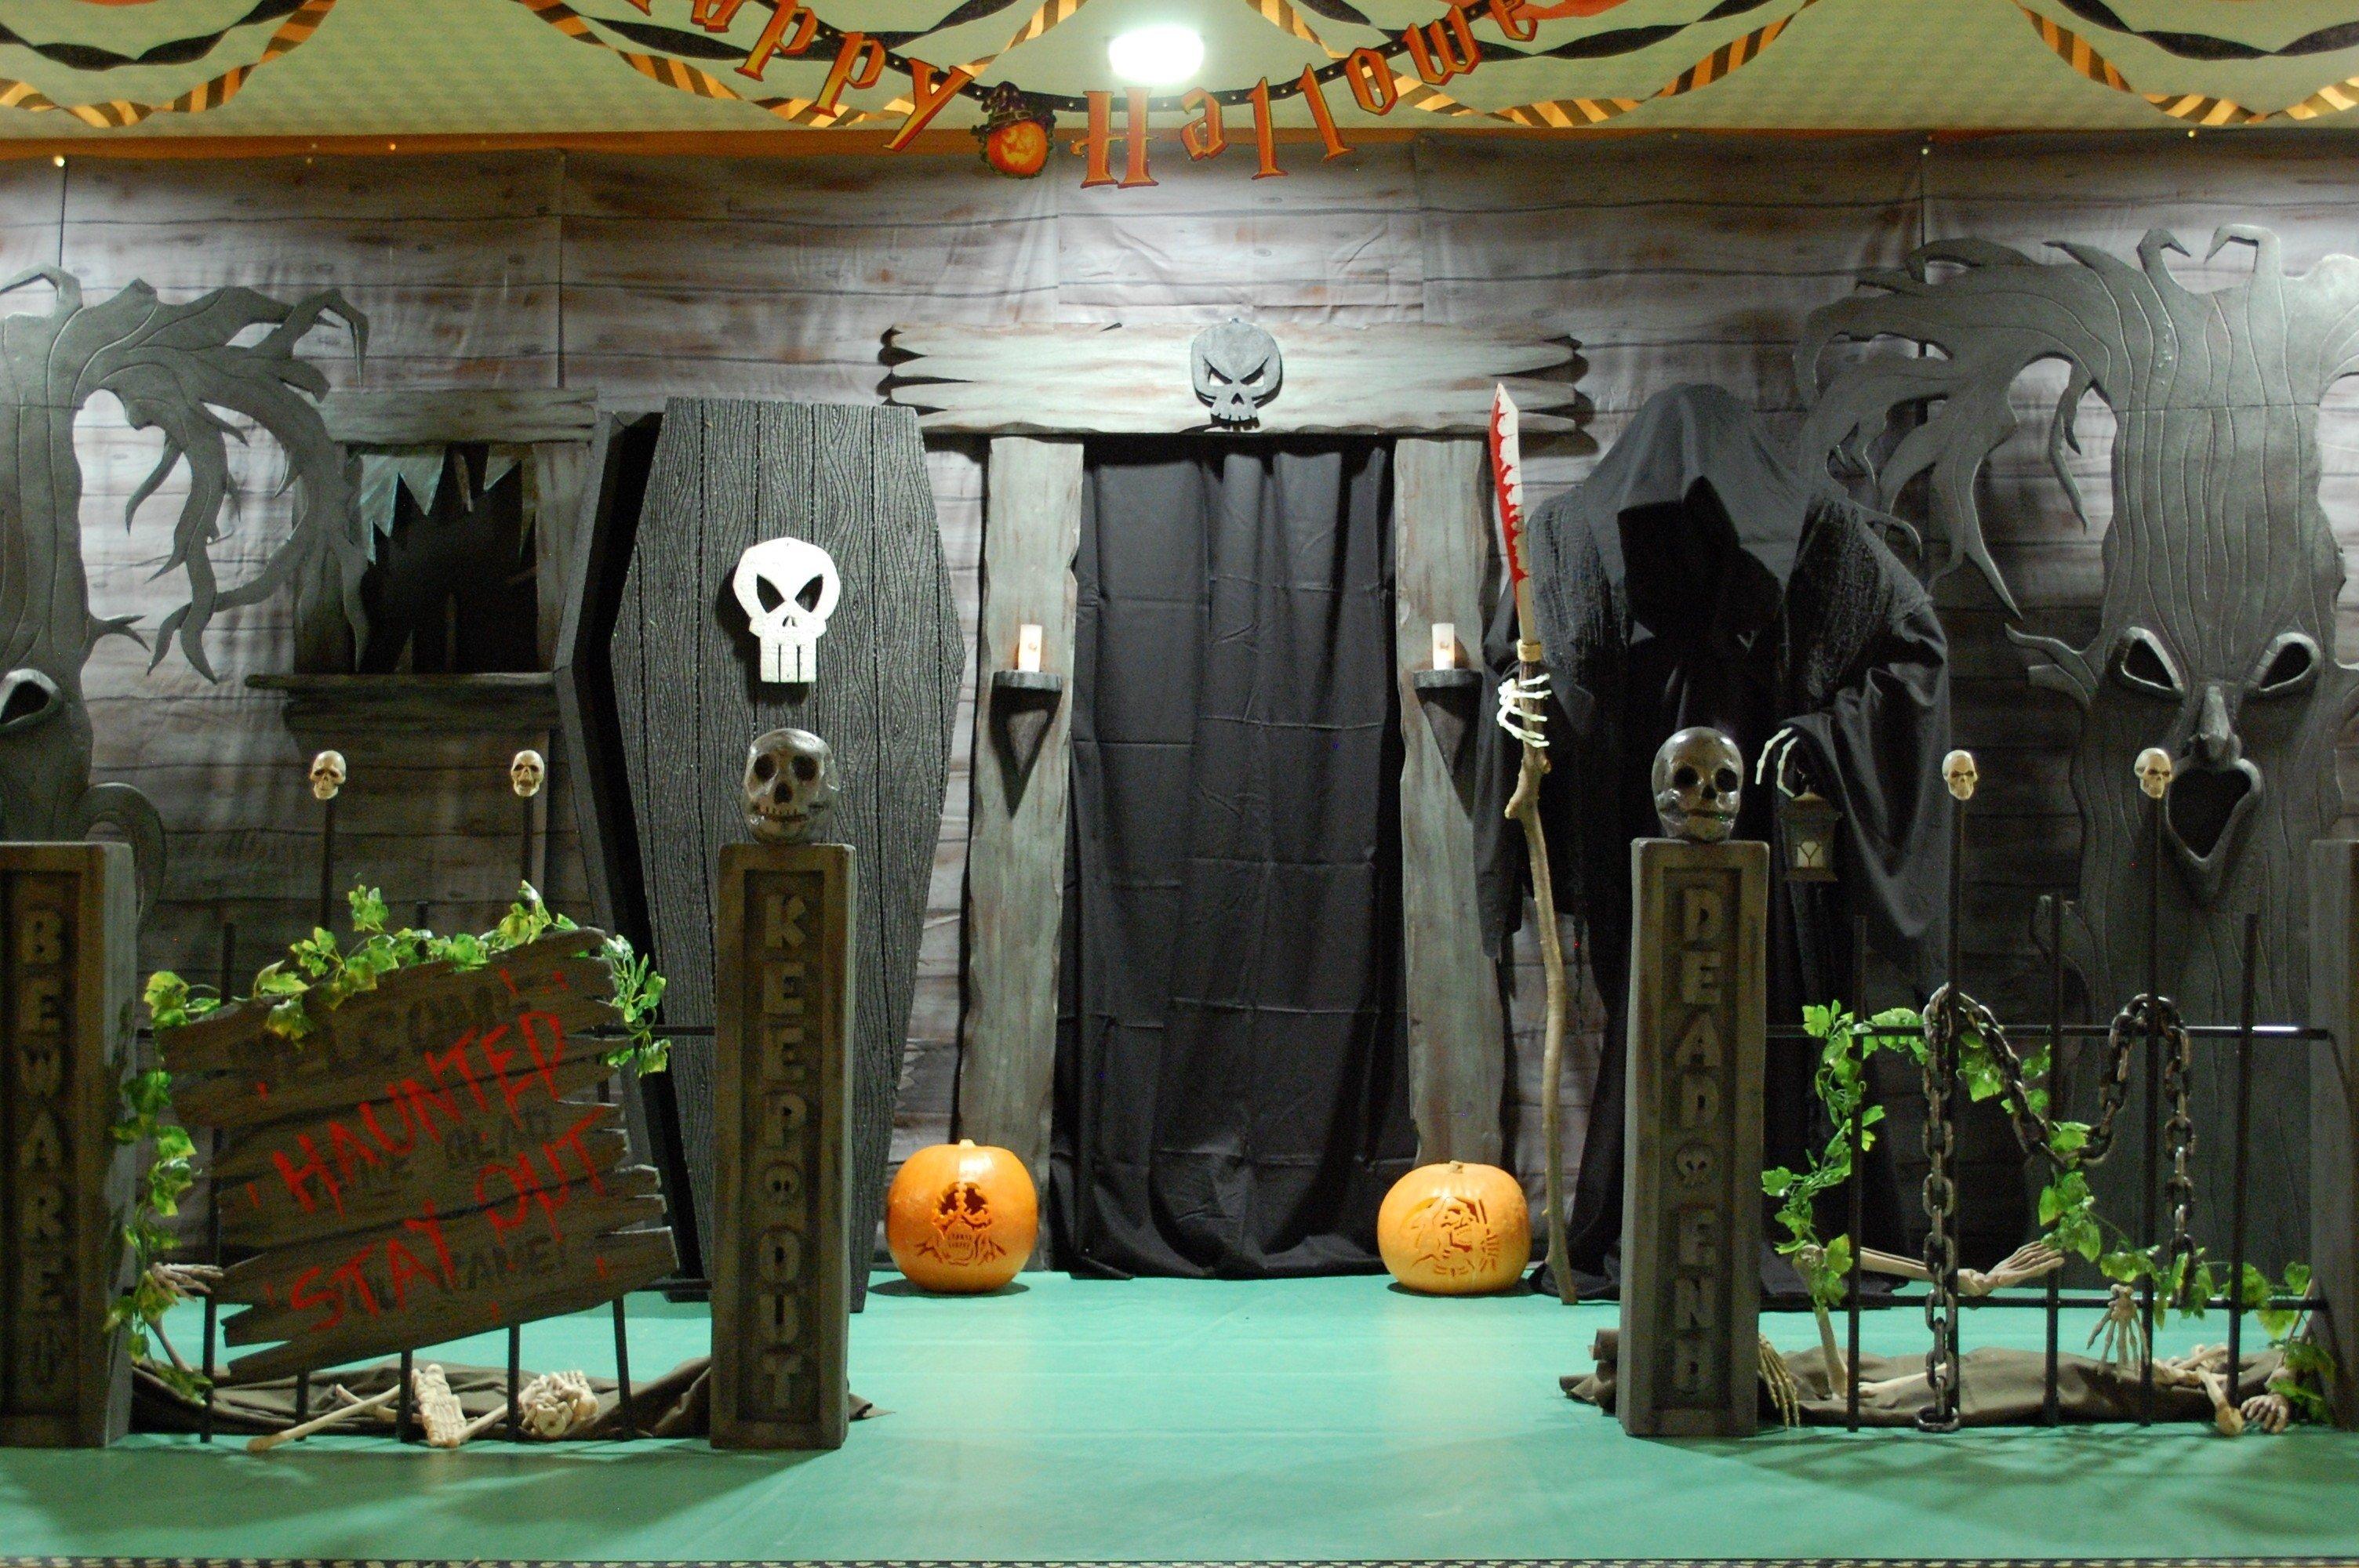 10 Stunning Halloween Haunted House Room Ideas haunted house scary ideas 2021